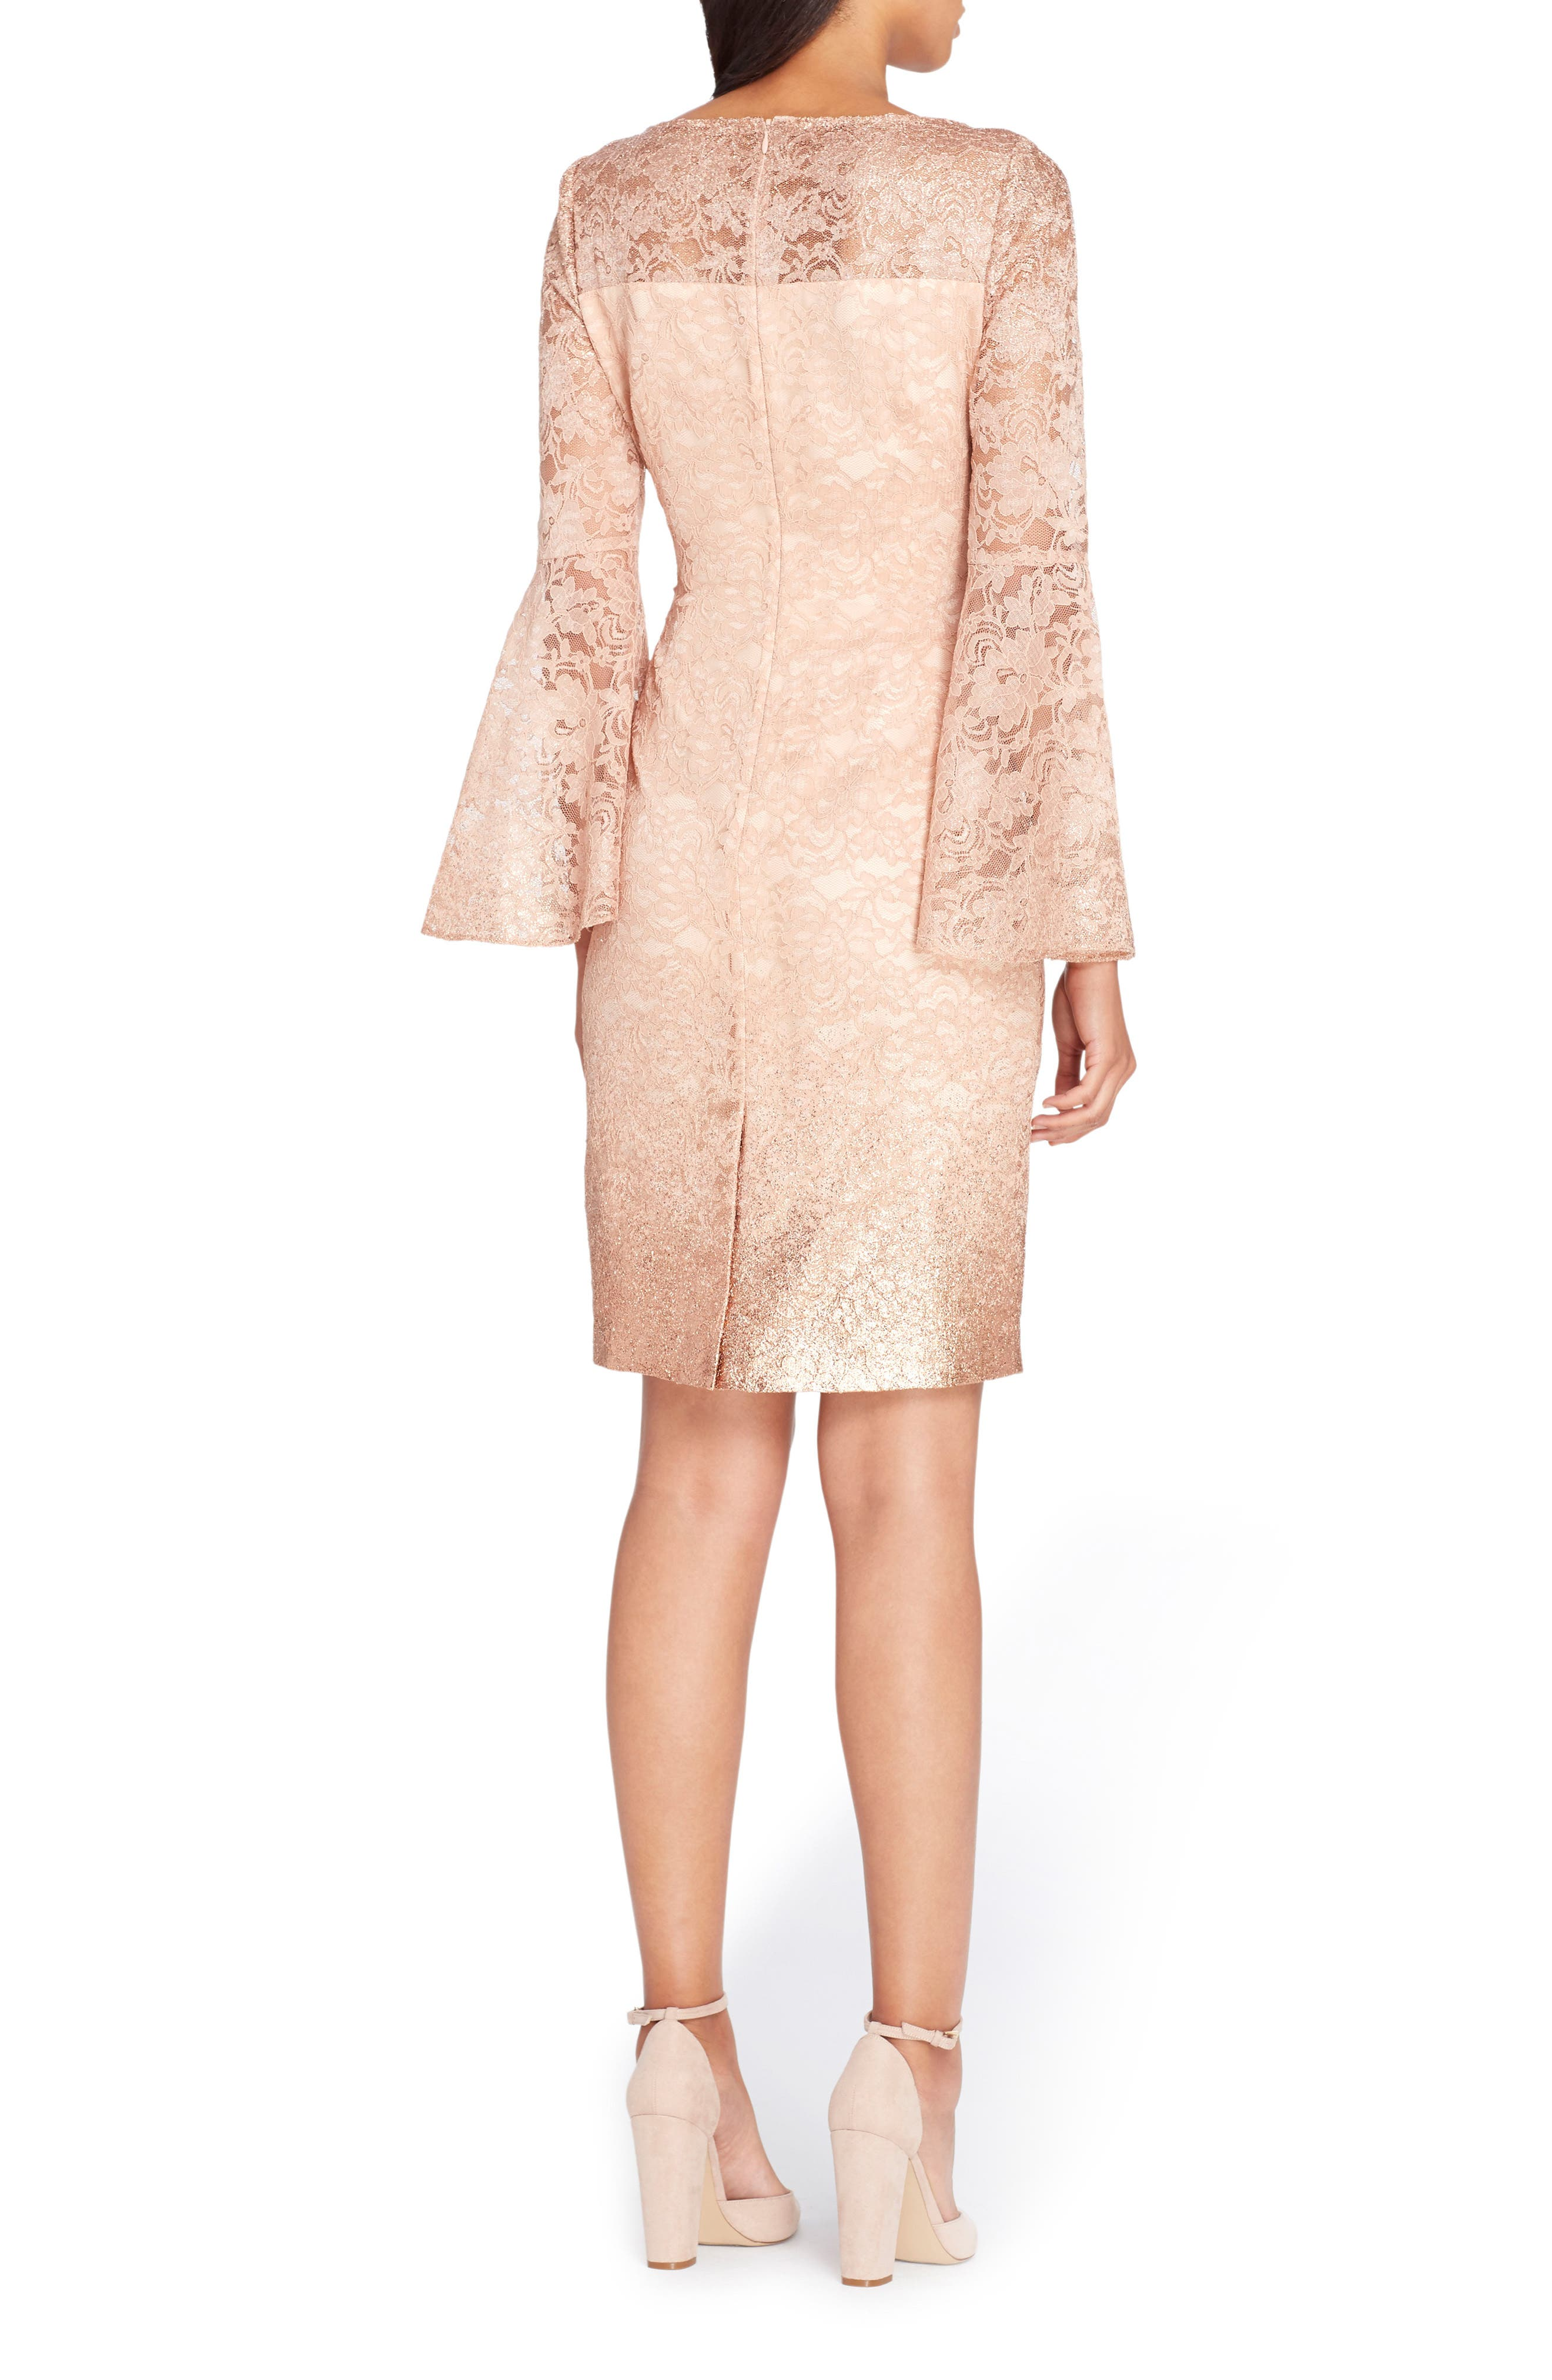 Lace Bell Sleeve Sheath Dress,                             Alternate thumbnail 2, color,